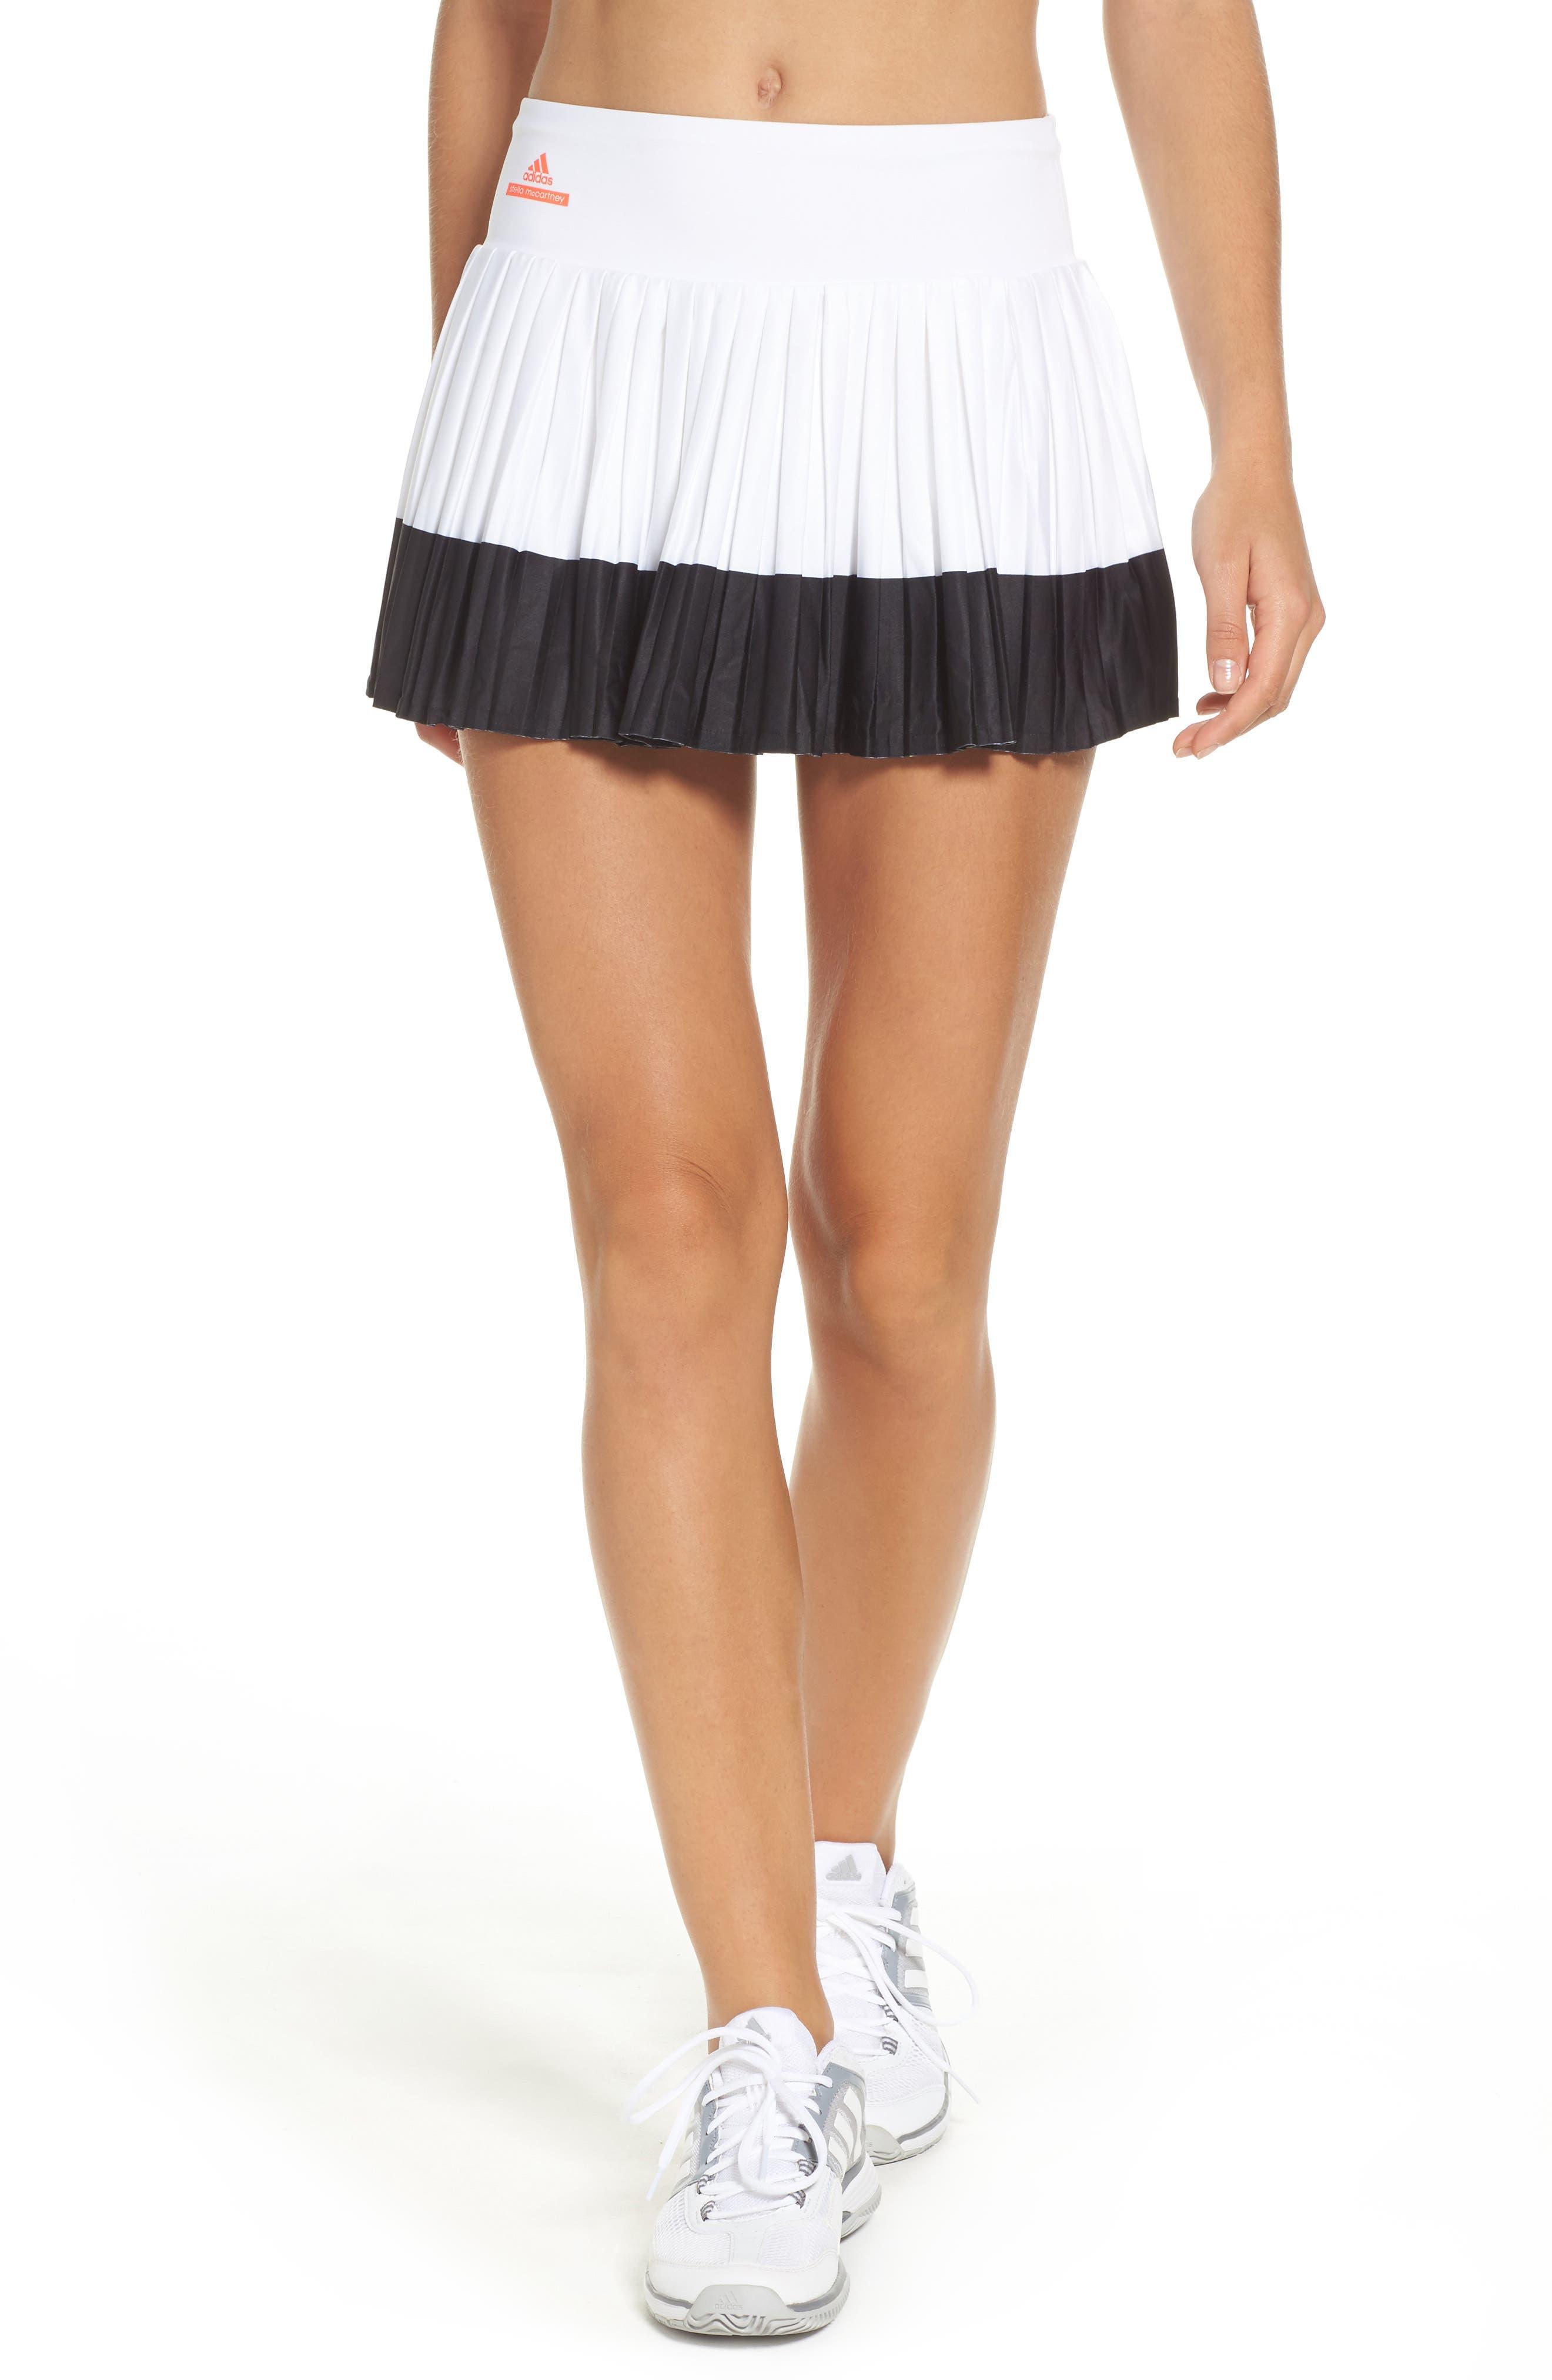 Alternate Image 1 Selected - adidas by Stella McCartney Barricade Skirt